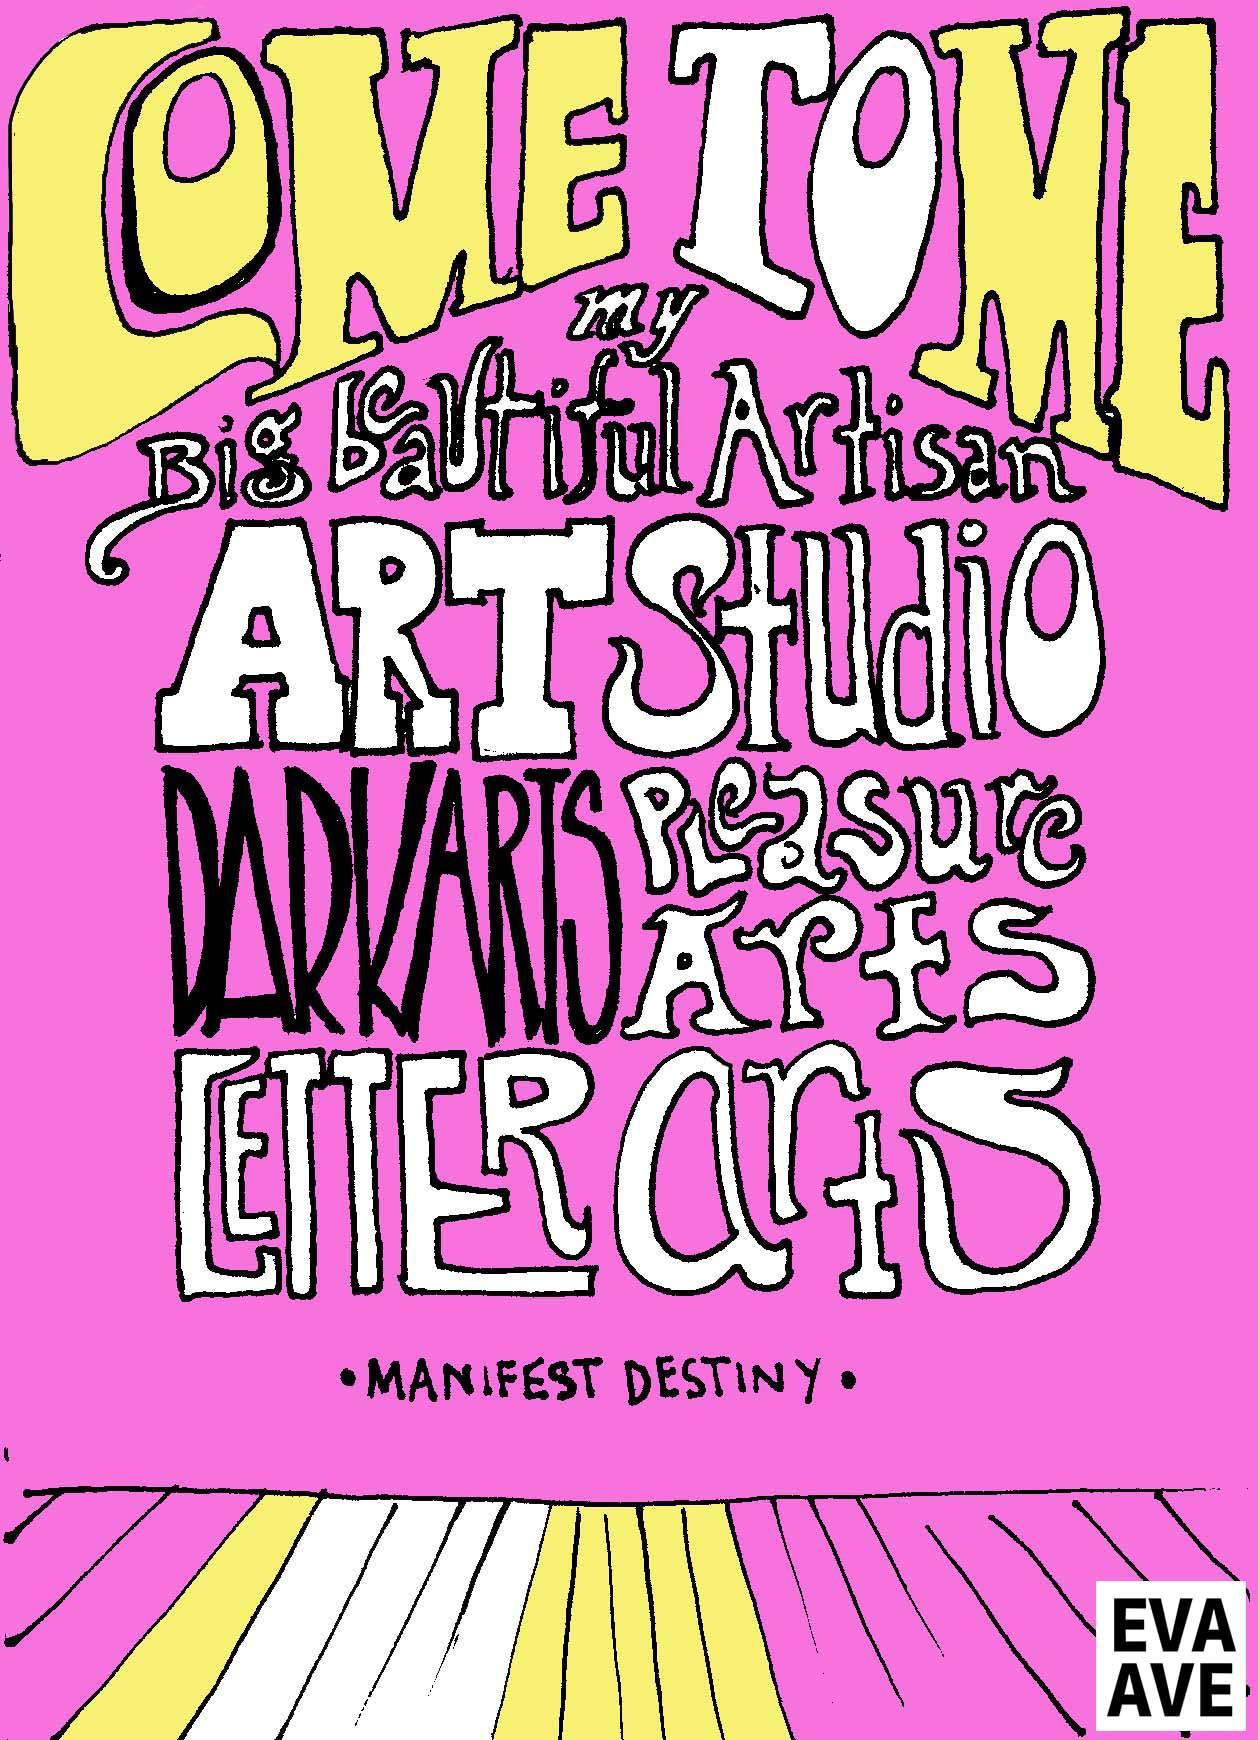 studio manifest copy.jpg